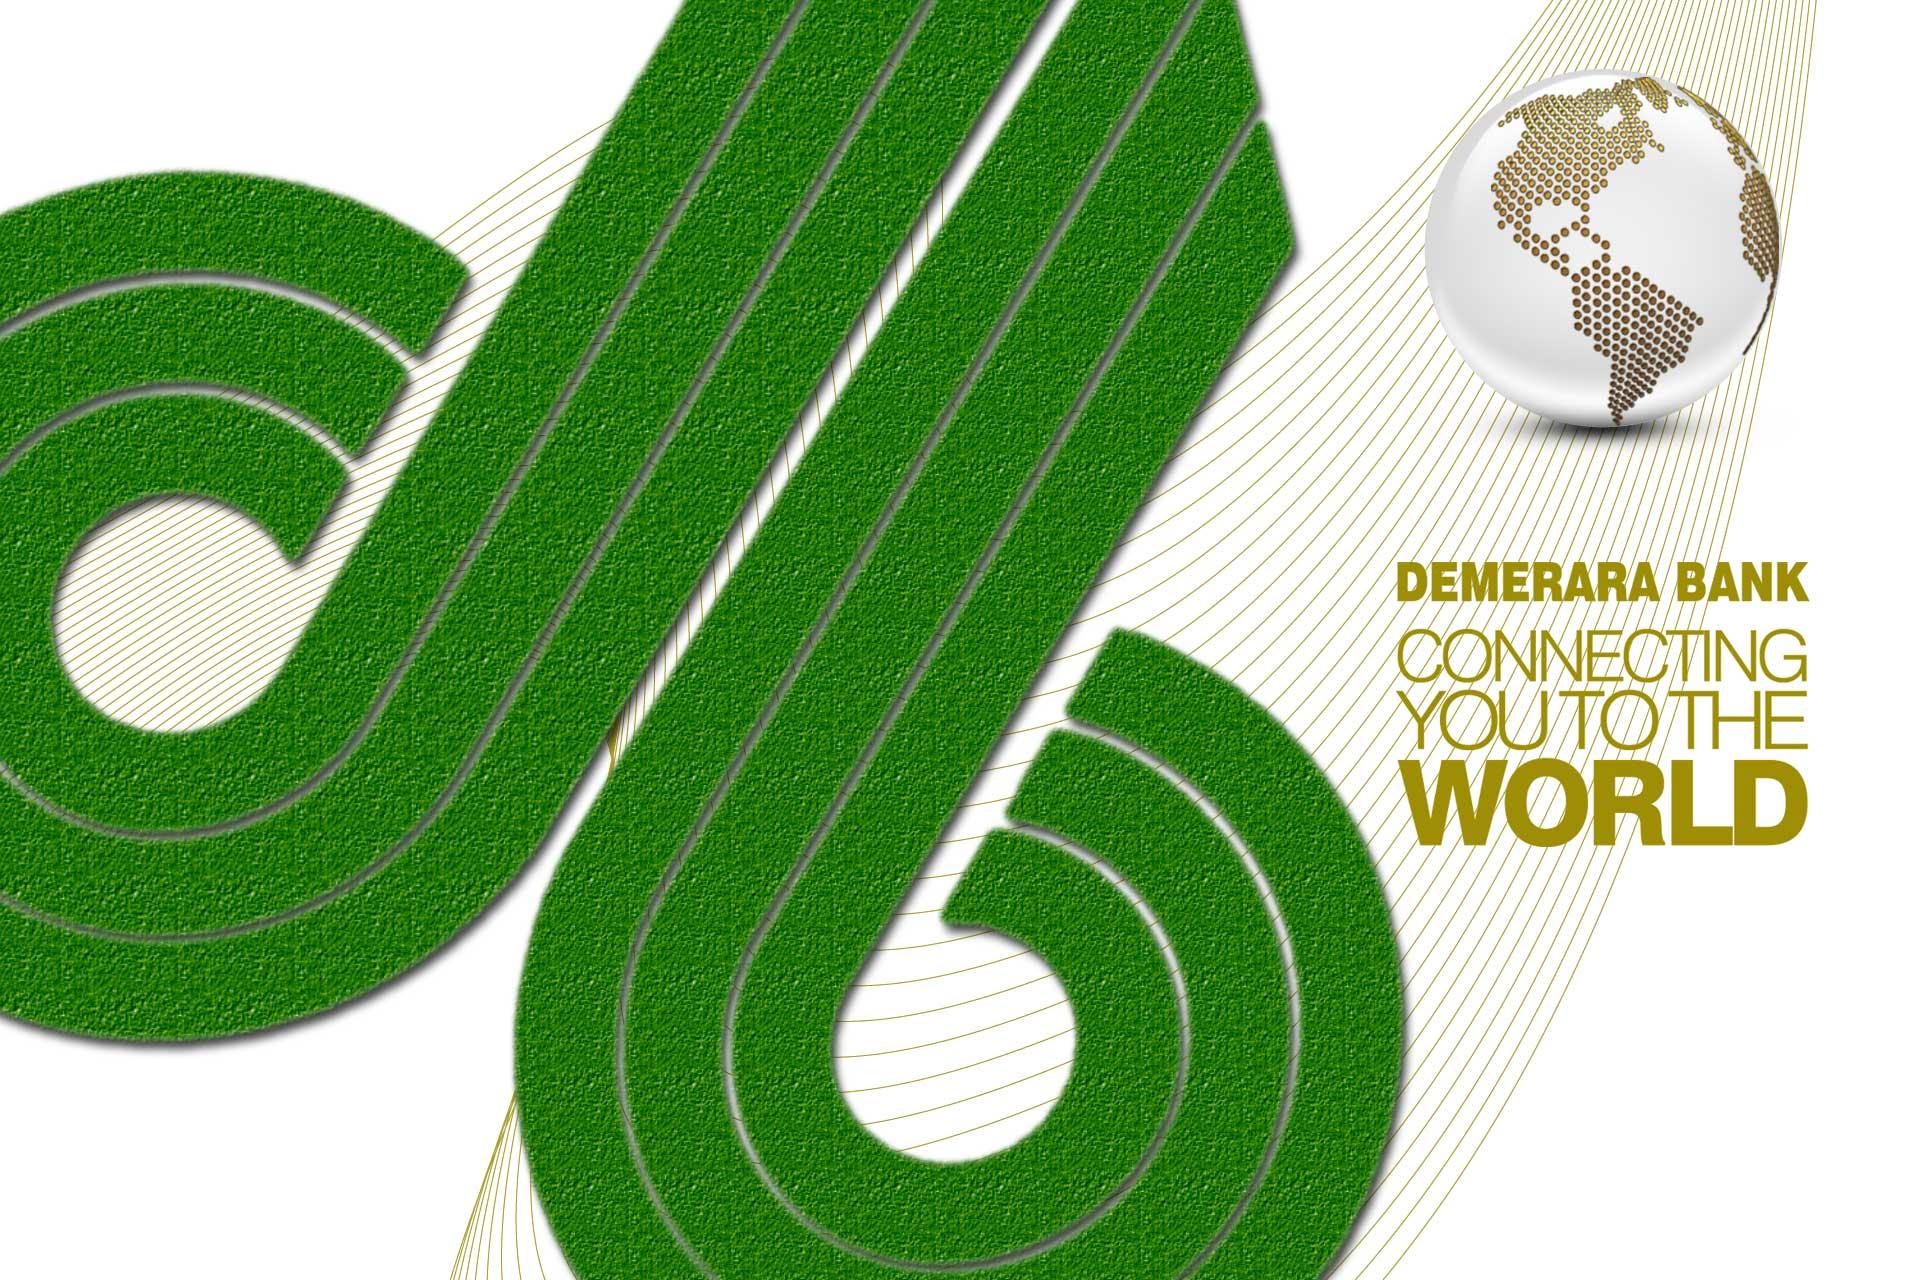 demerara bank Demerara Bank Limited